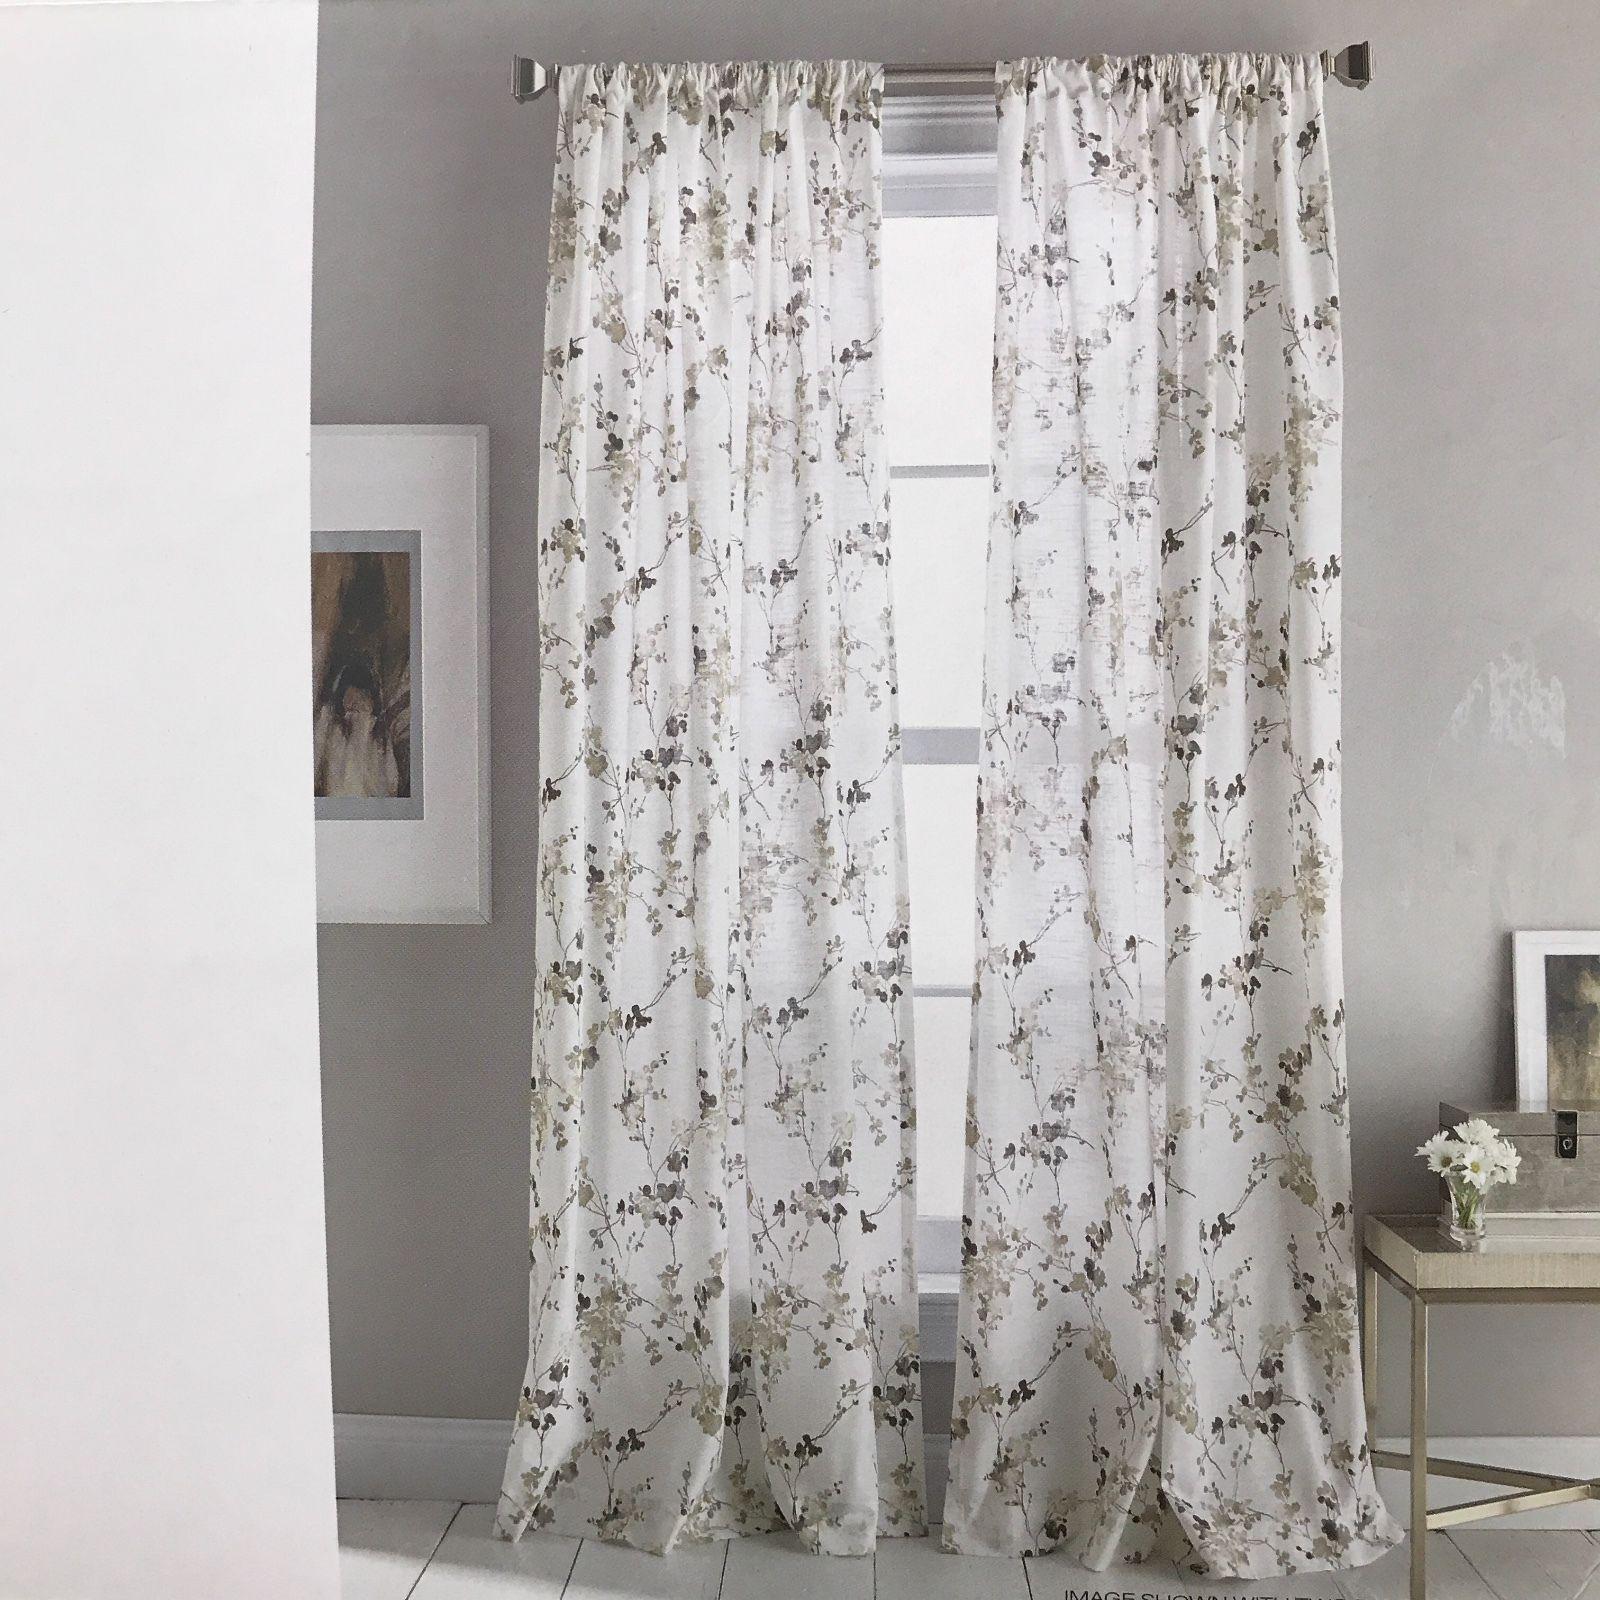 DKNY 2 Wallflower Rod Pocket Window Curtains Panels Drapes 50x96 50x84 New